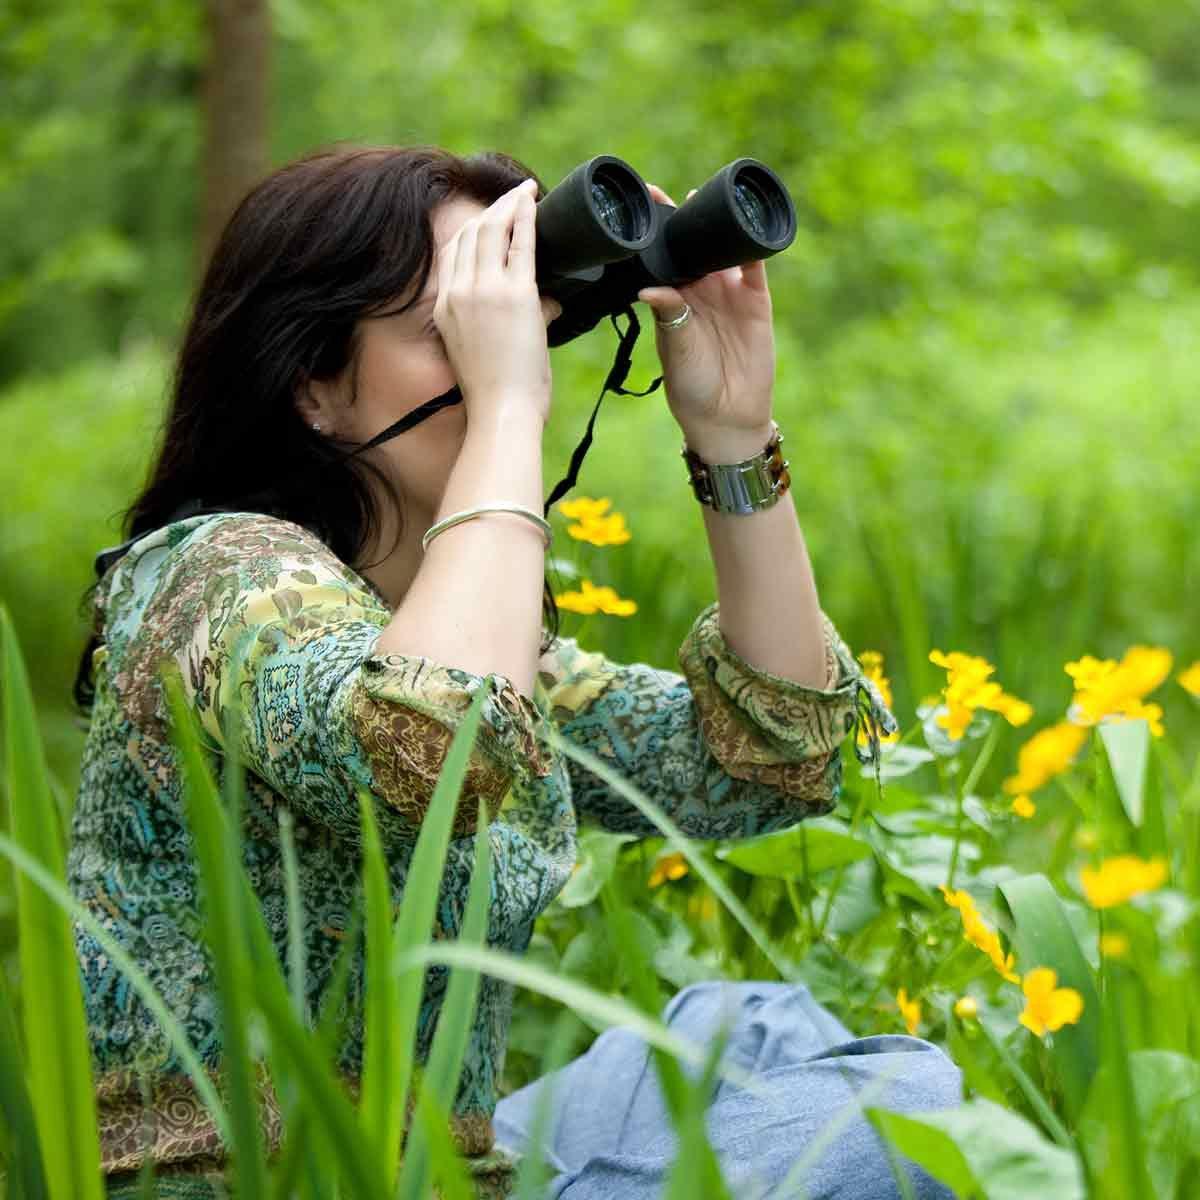 Woman-watches-birds-through-binoculars